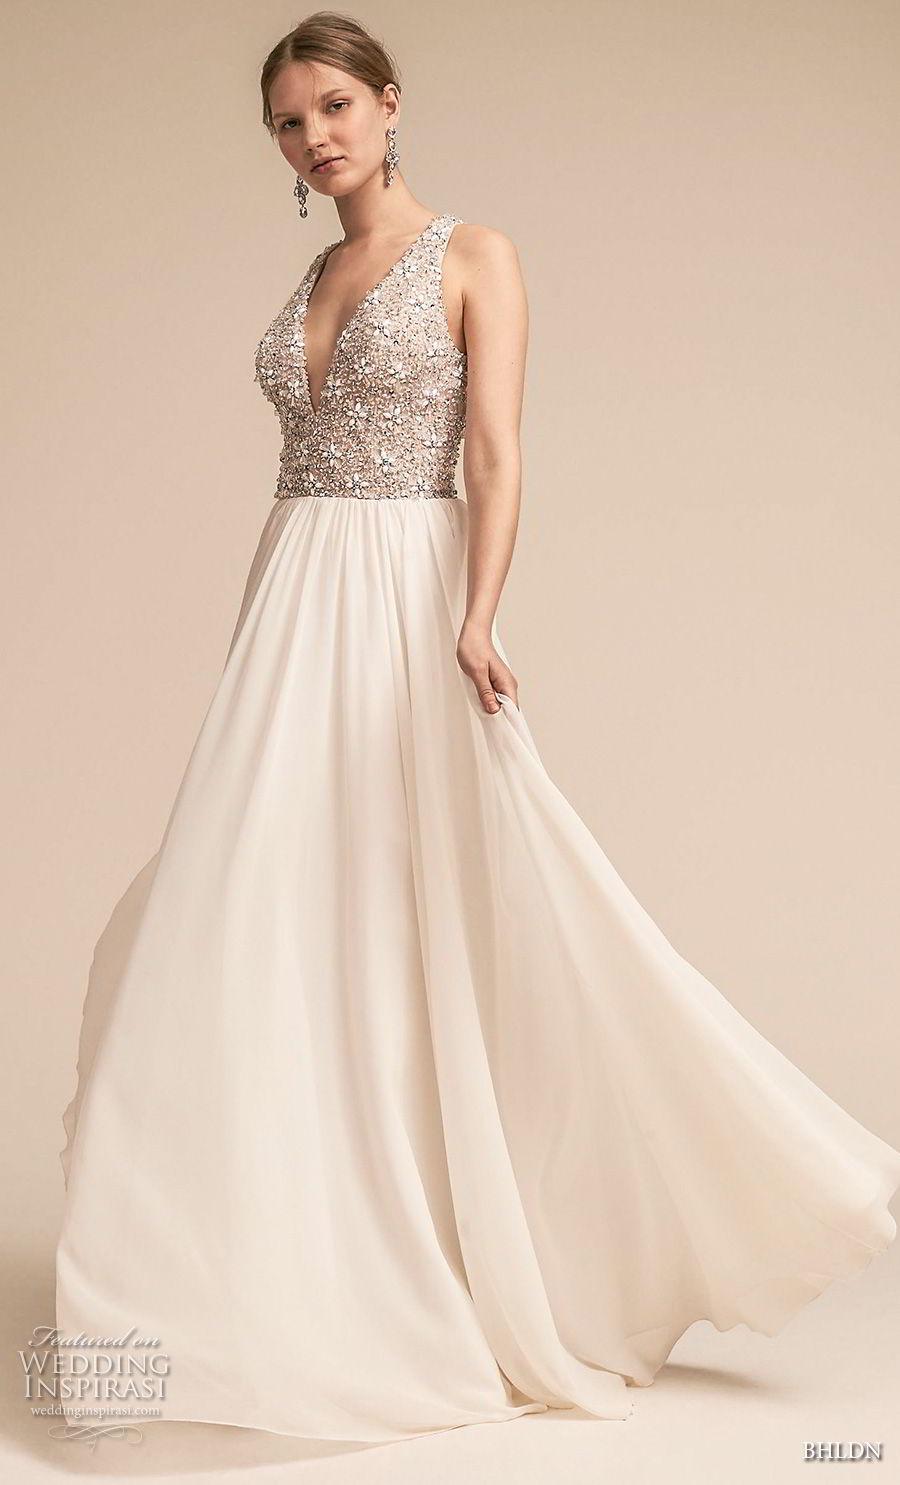 bhldn 2018 away bridal sleeveless deep v neck heavily embellished bodice romantic glamorous soft a  line wedding dress covered back sweep train (5) mv